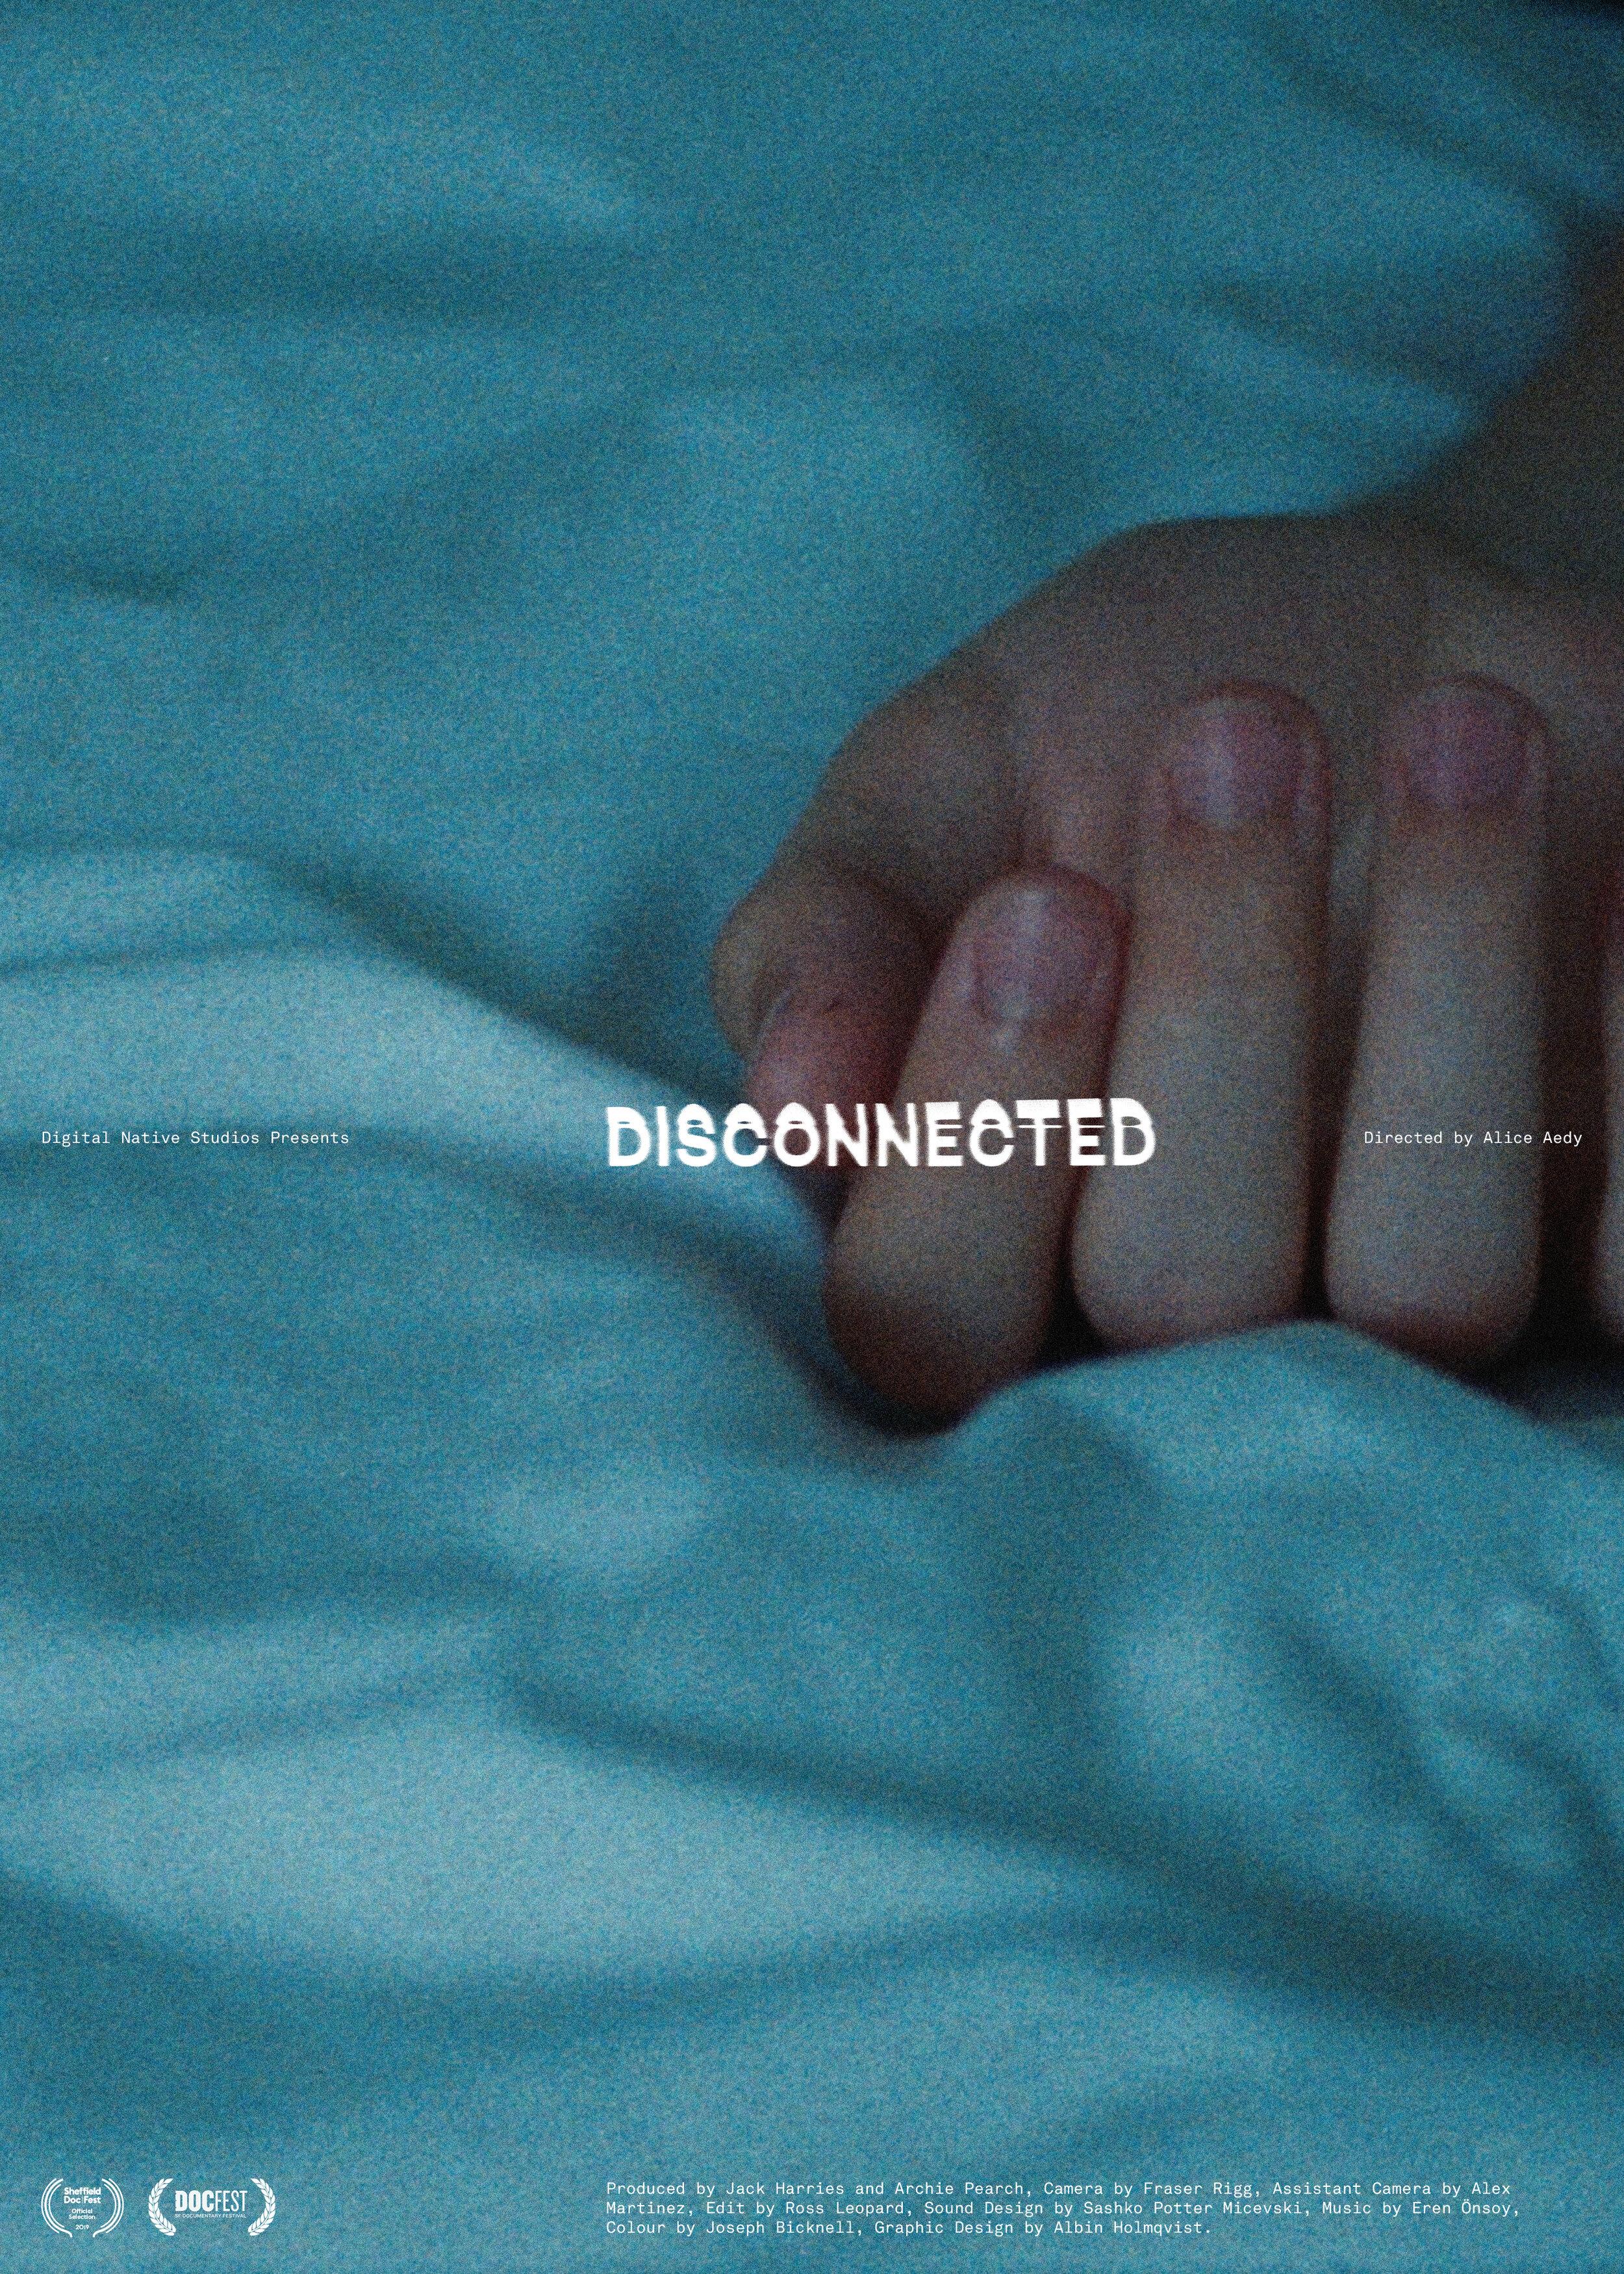 SAH_DISCONNECTED_POSTER03.jpg